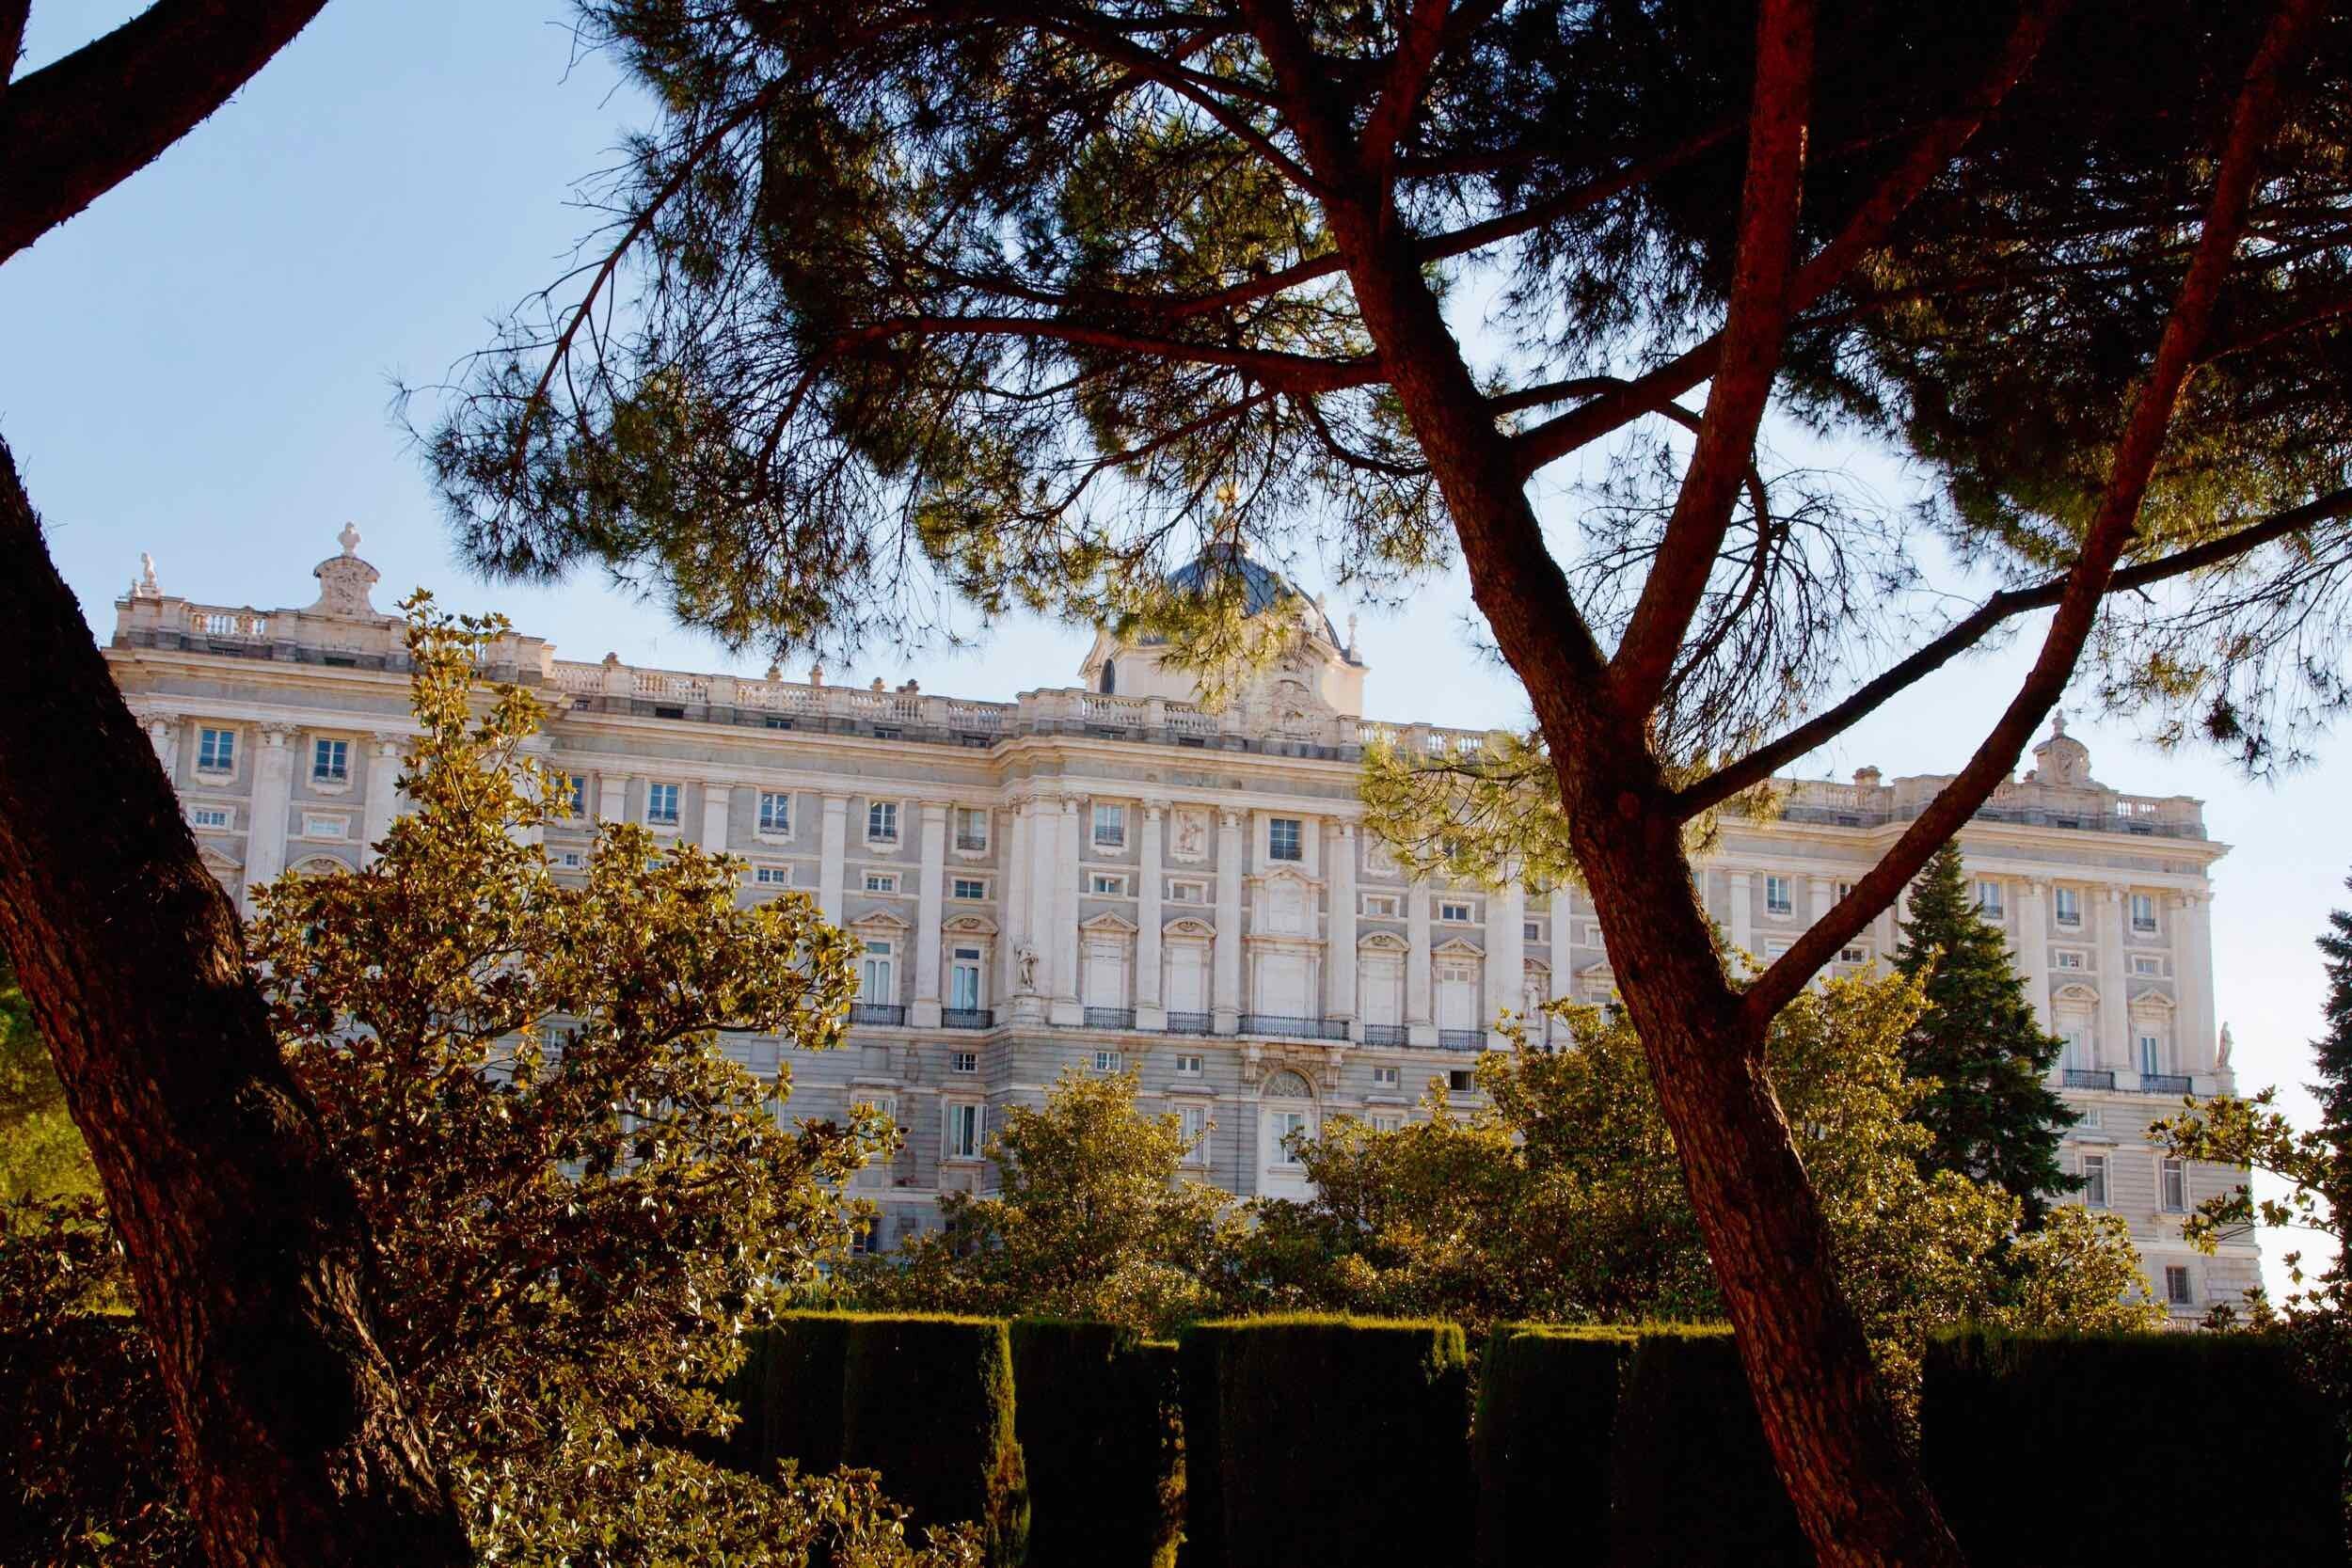 hemels-madrid-koninklijk-paleis-jardines-sabatini.jpg